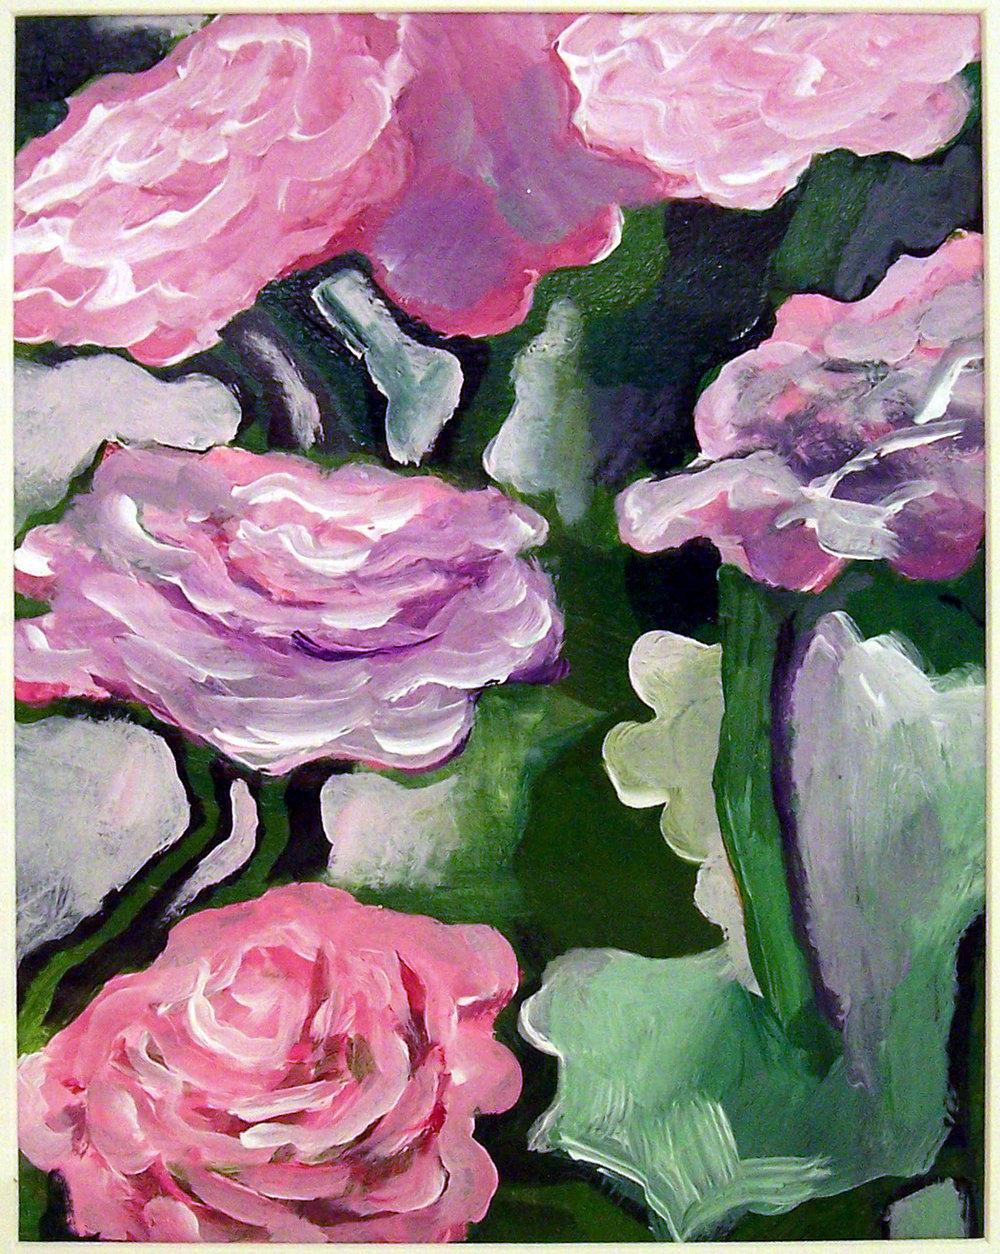 NMarcel-2007-acrylic on paper-pink roses.jpg